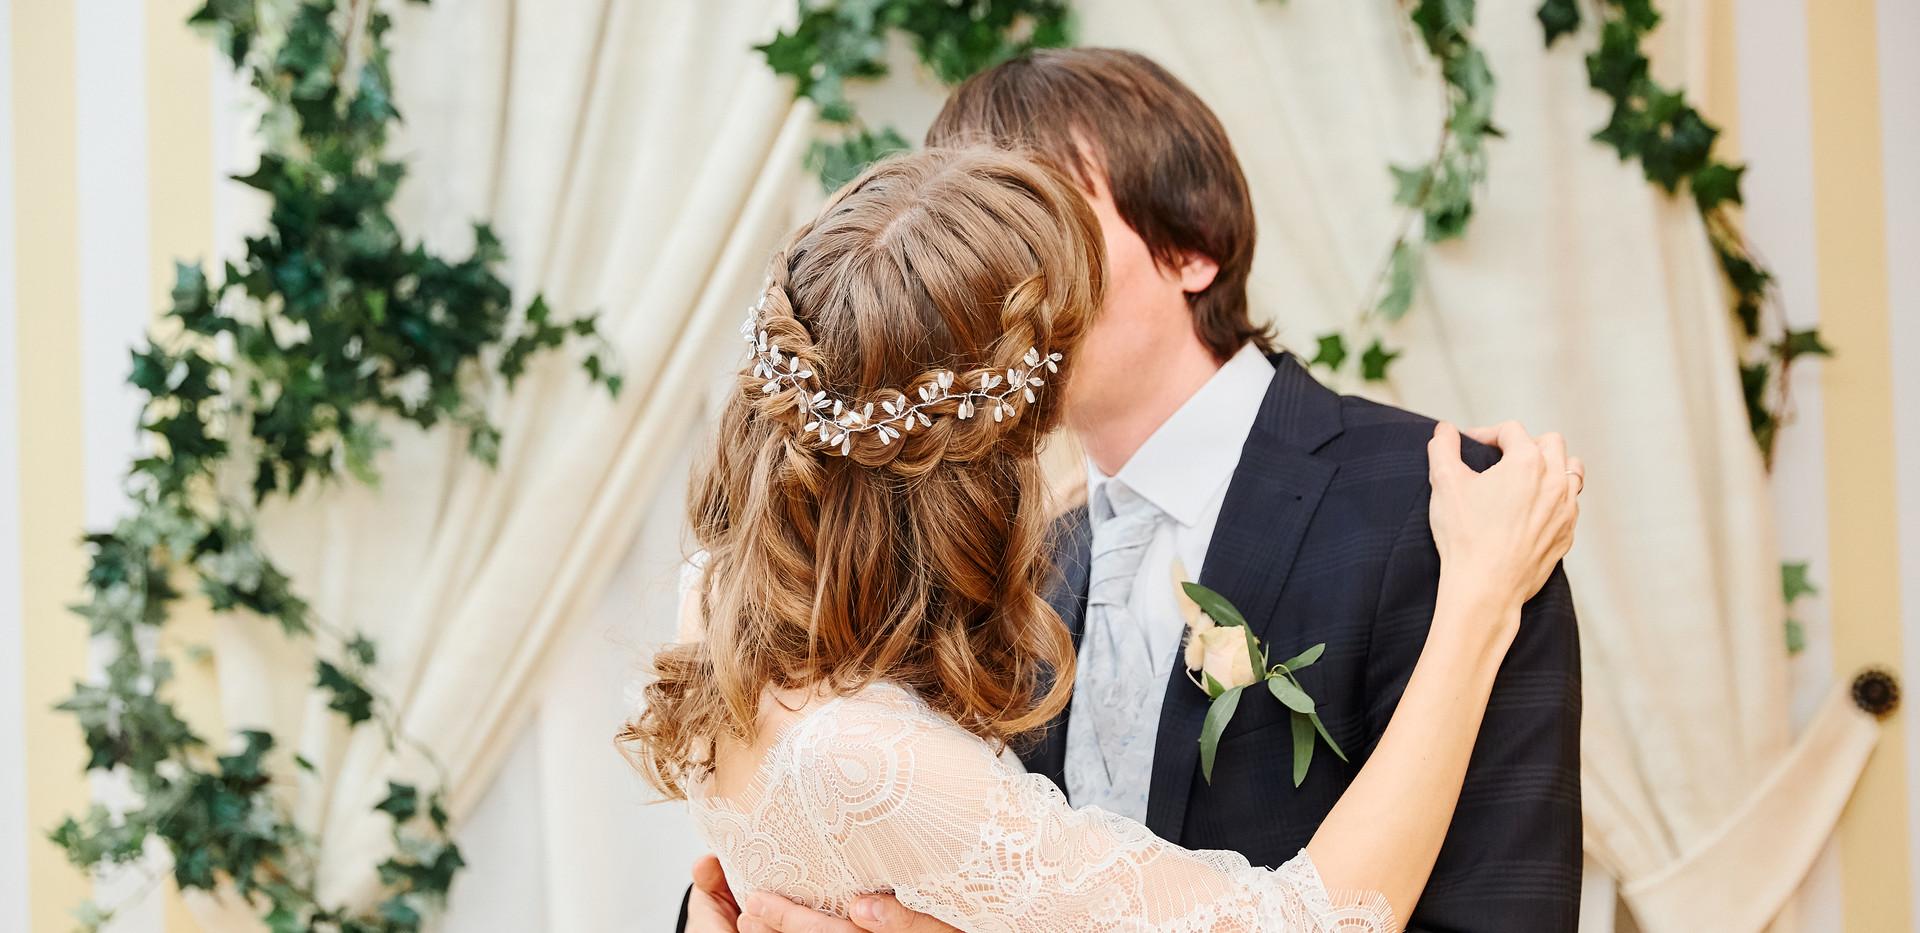 задник на свадьбу